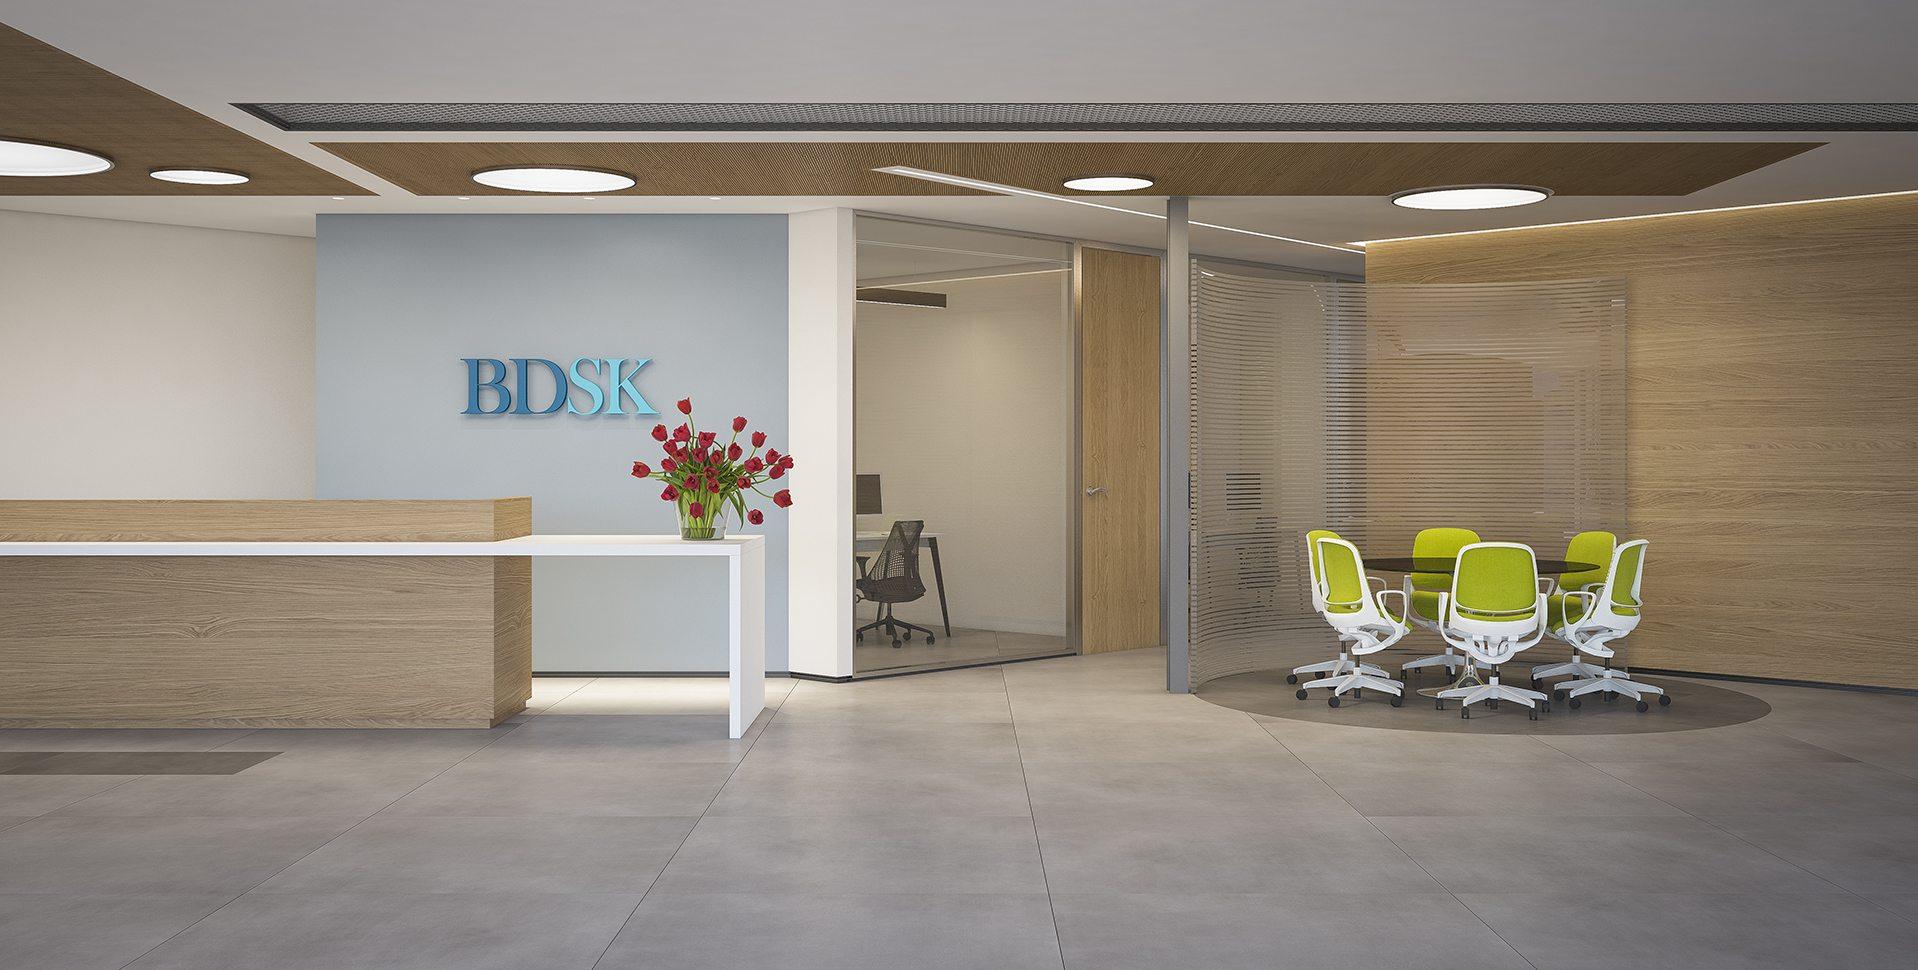 Architectural Visualization: BDSK Reception by Dunsky Architects